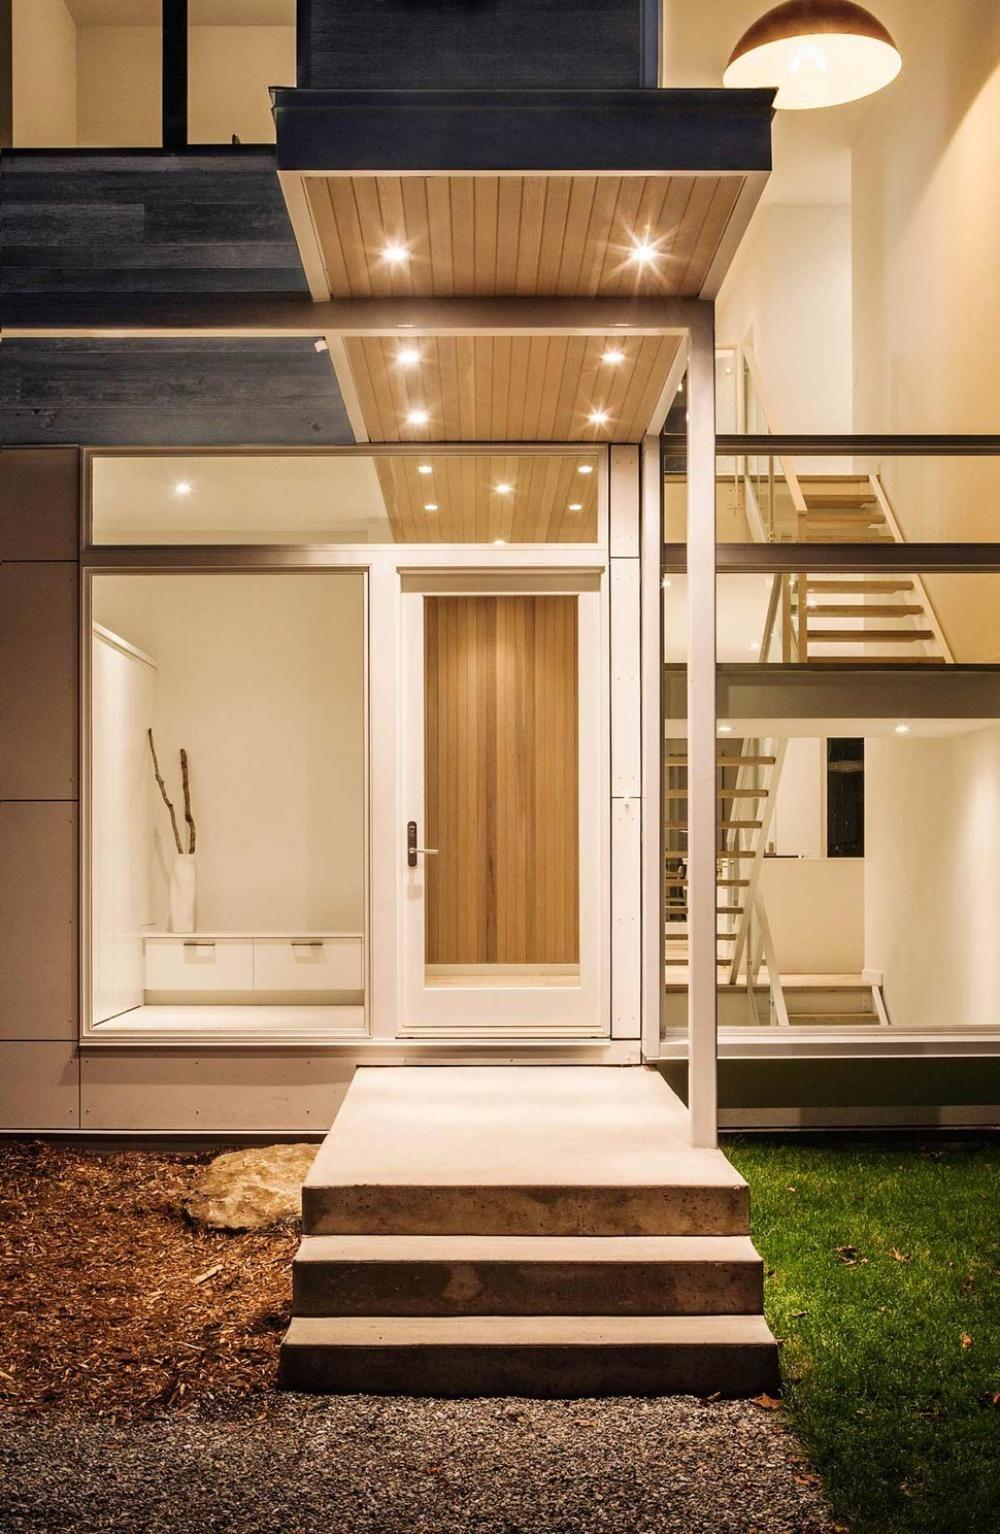 Awesome Entry Home Designs Photos - Interior Design Ideas ...